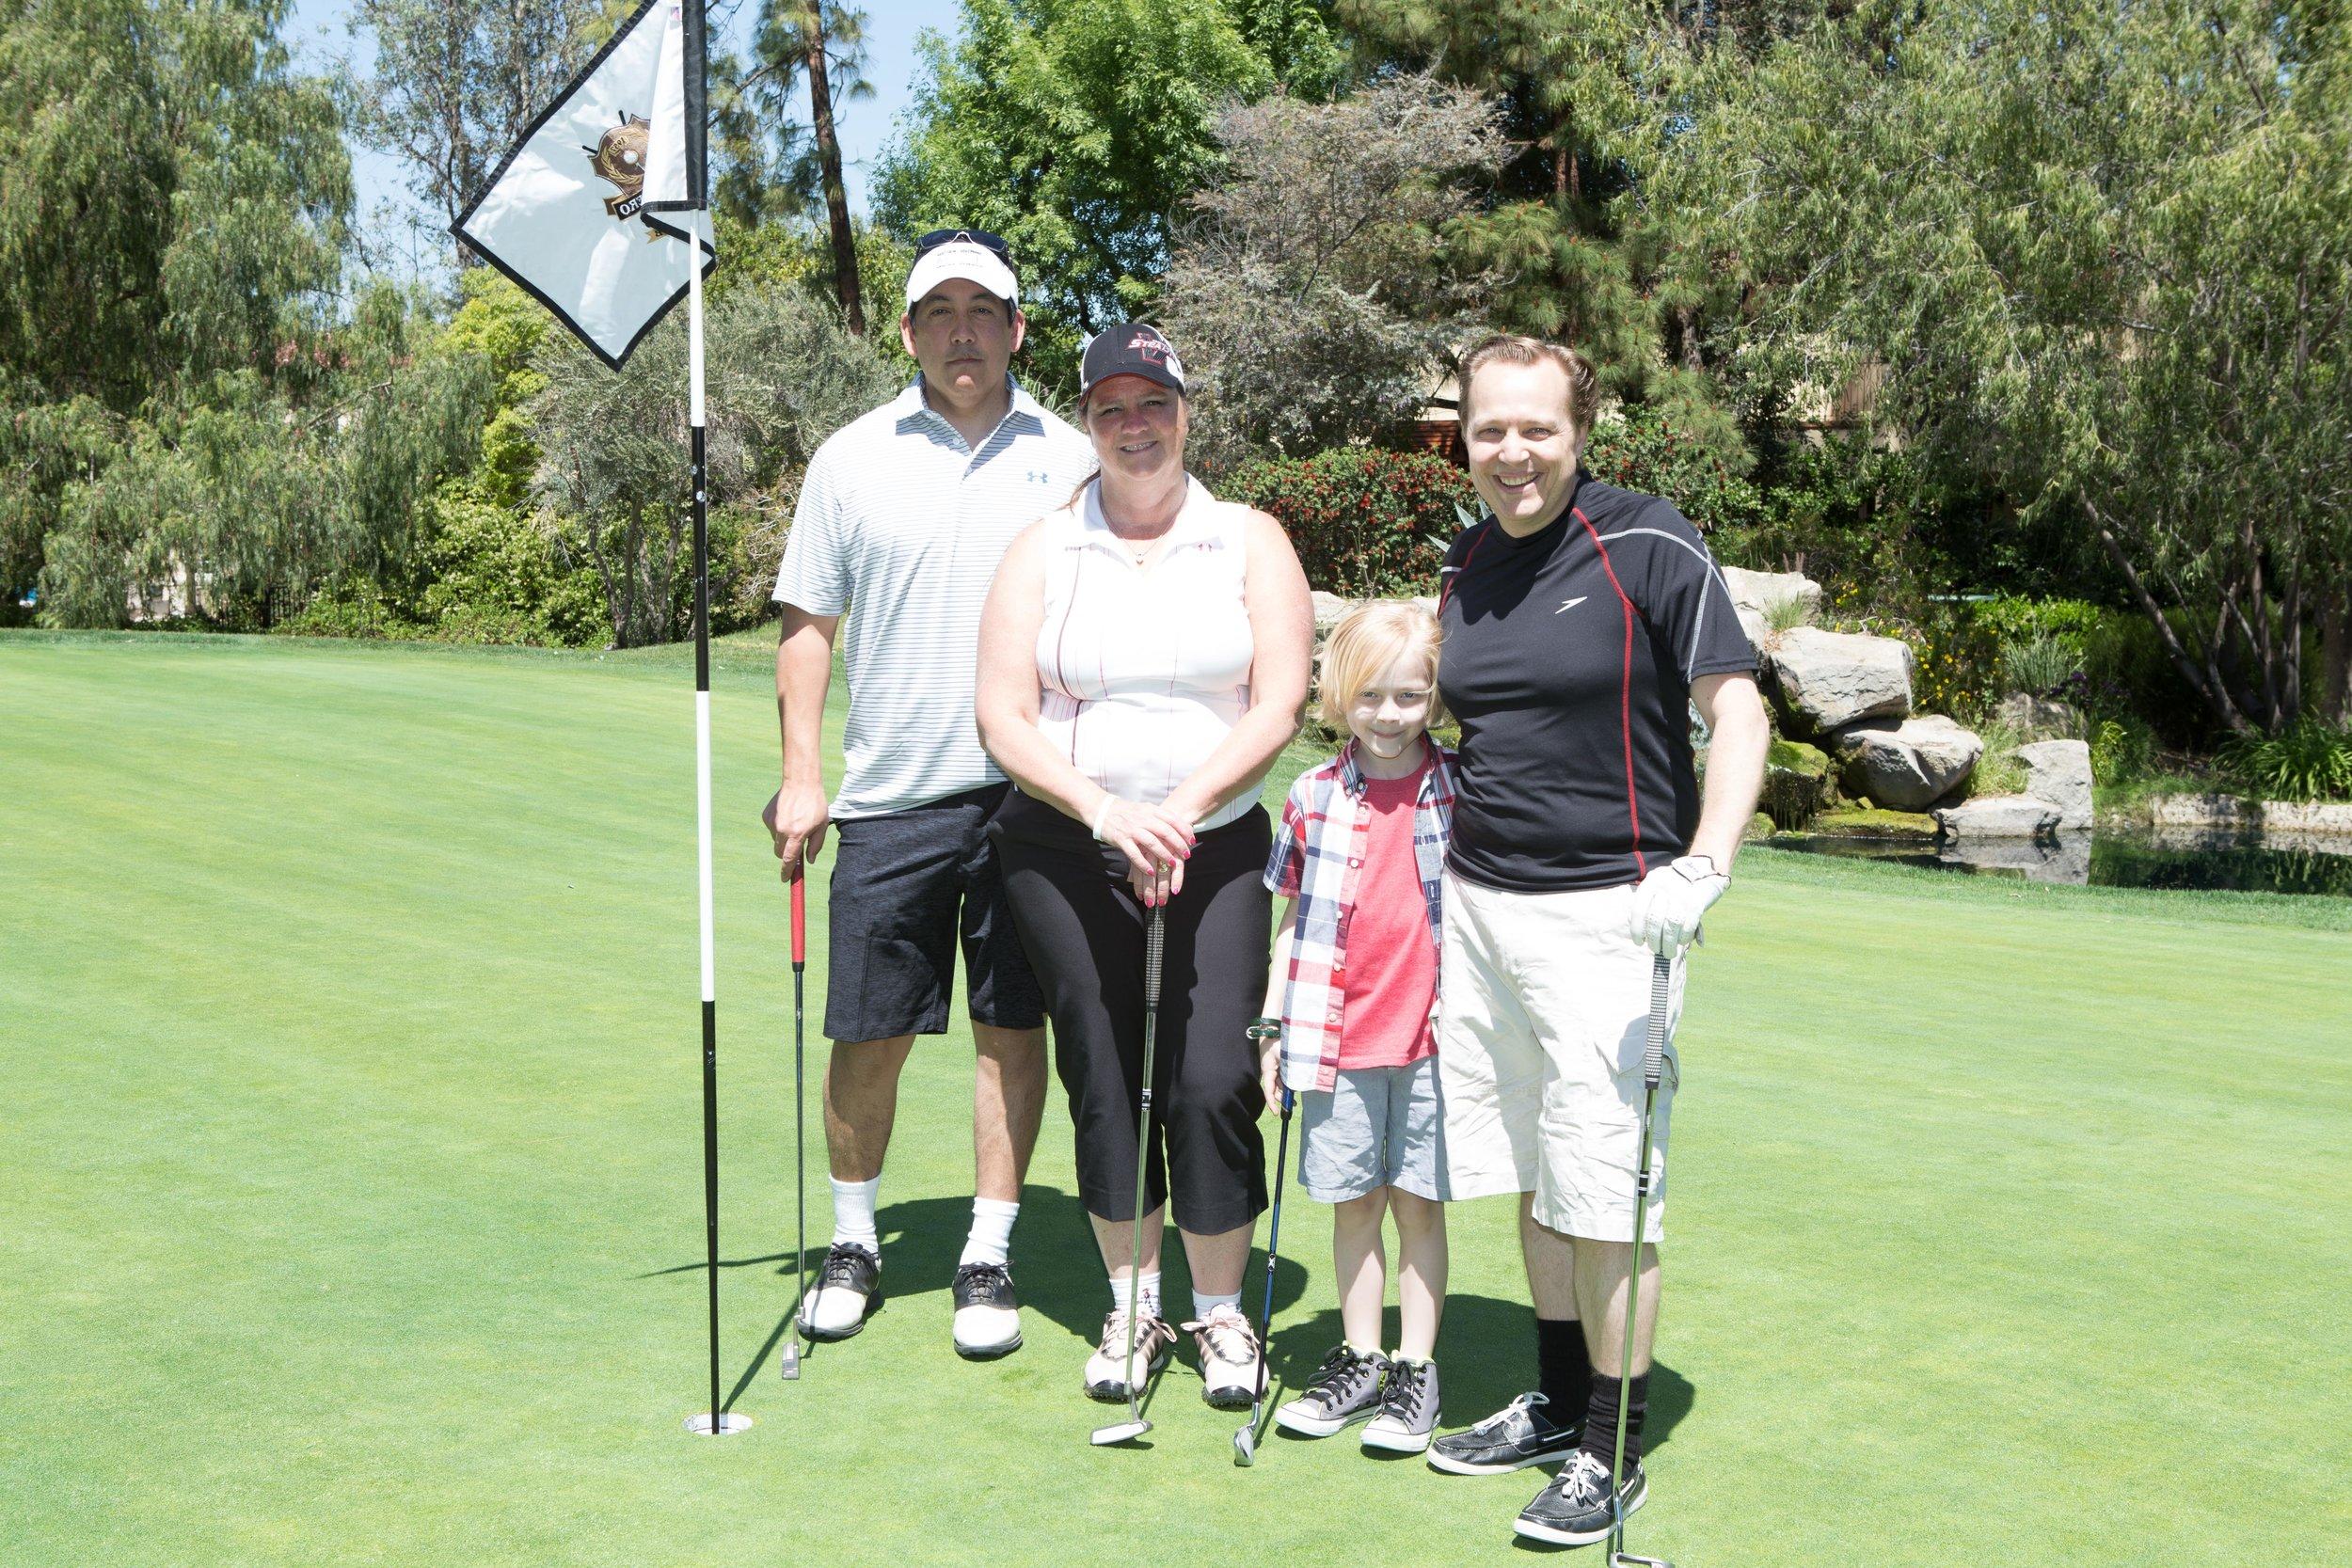 IMG_7909-Christian Ganiere (CELEBRITY) & golfers.jpg